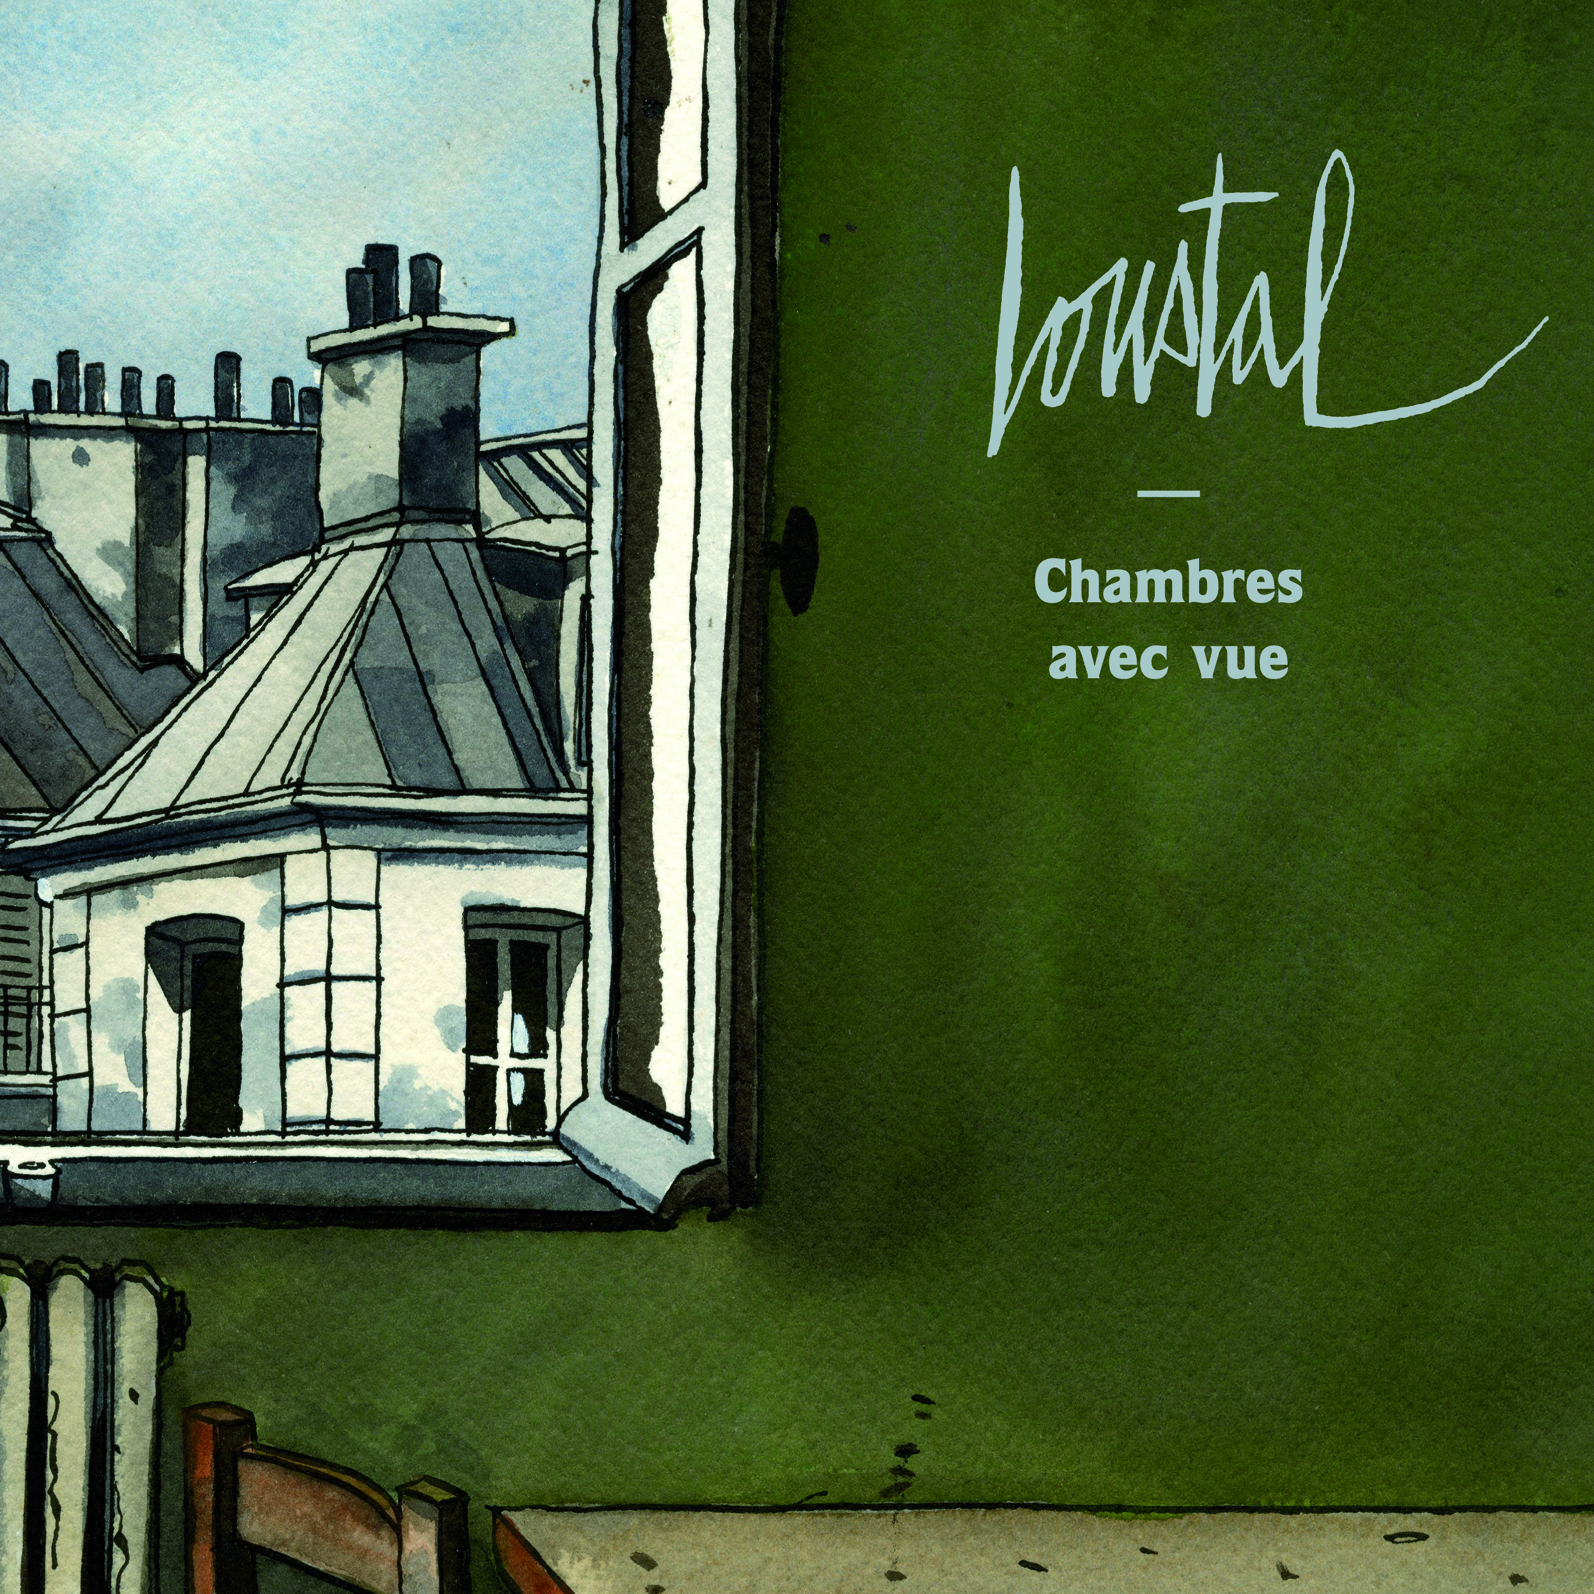 Catalogue loustal chambres avec vue 2011 bdfil for Chambre avec vue film streaming